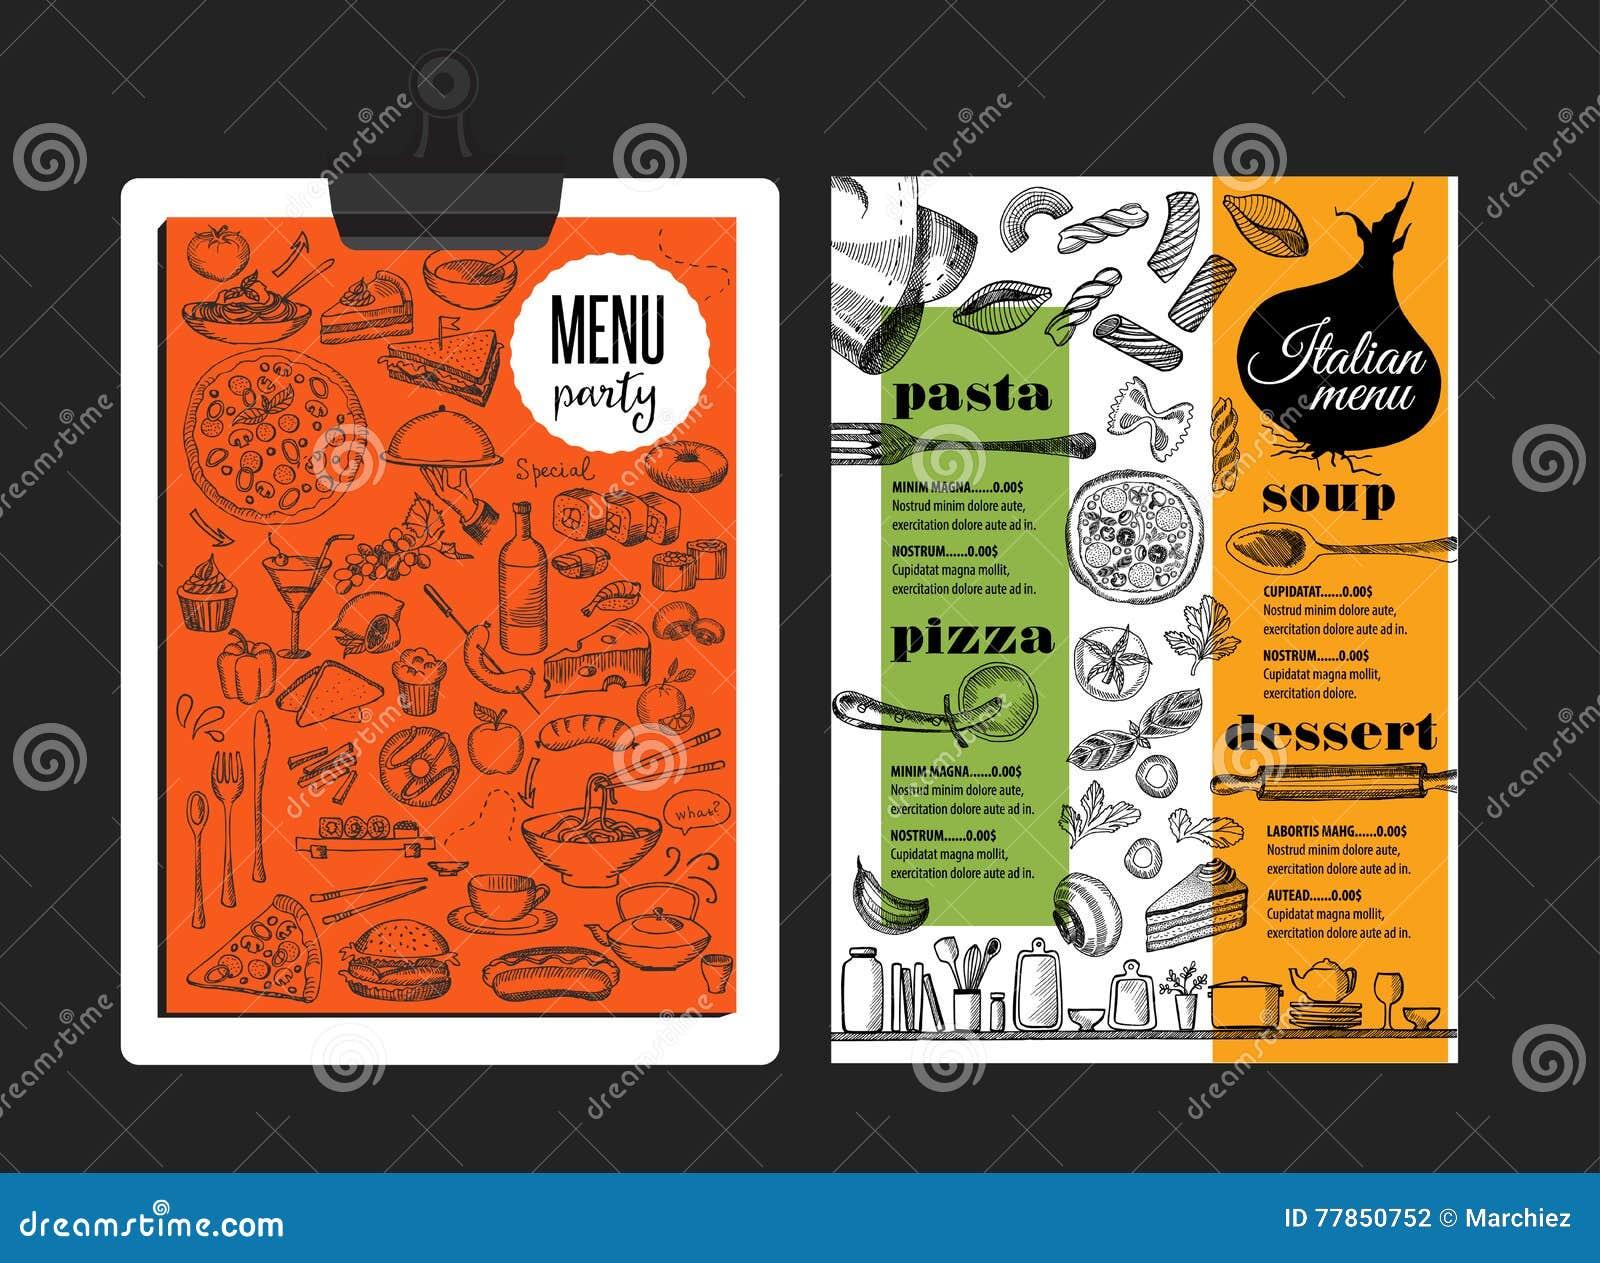 Menu Italian Restaurant Food Template Placemat Stock Vector Illustration Of Drawing Design 77850752